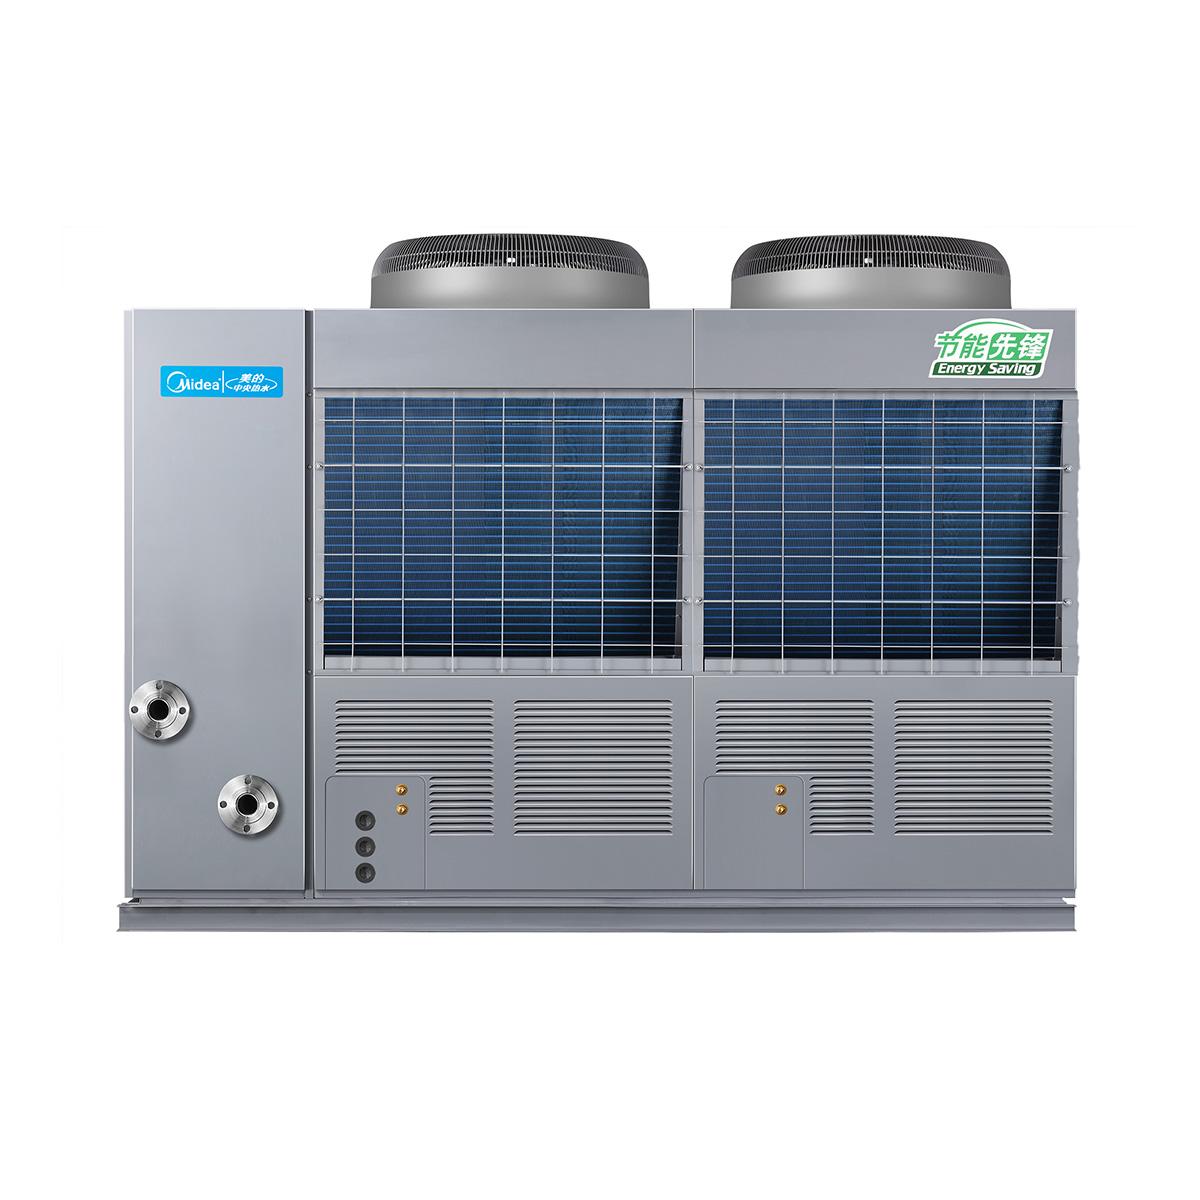 Midea/美的 RSJ-800/MS-820空气能热水器套机 说明书.pdf